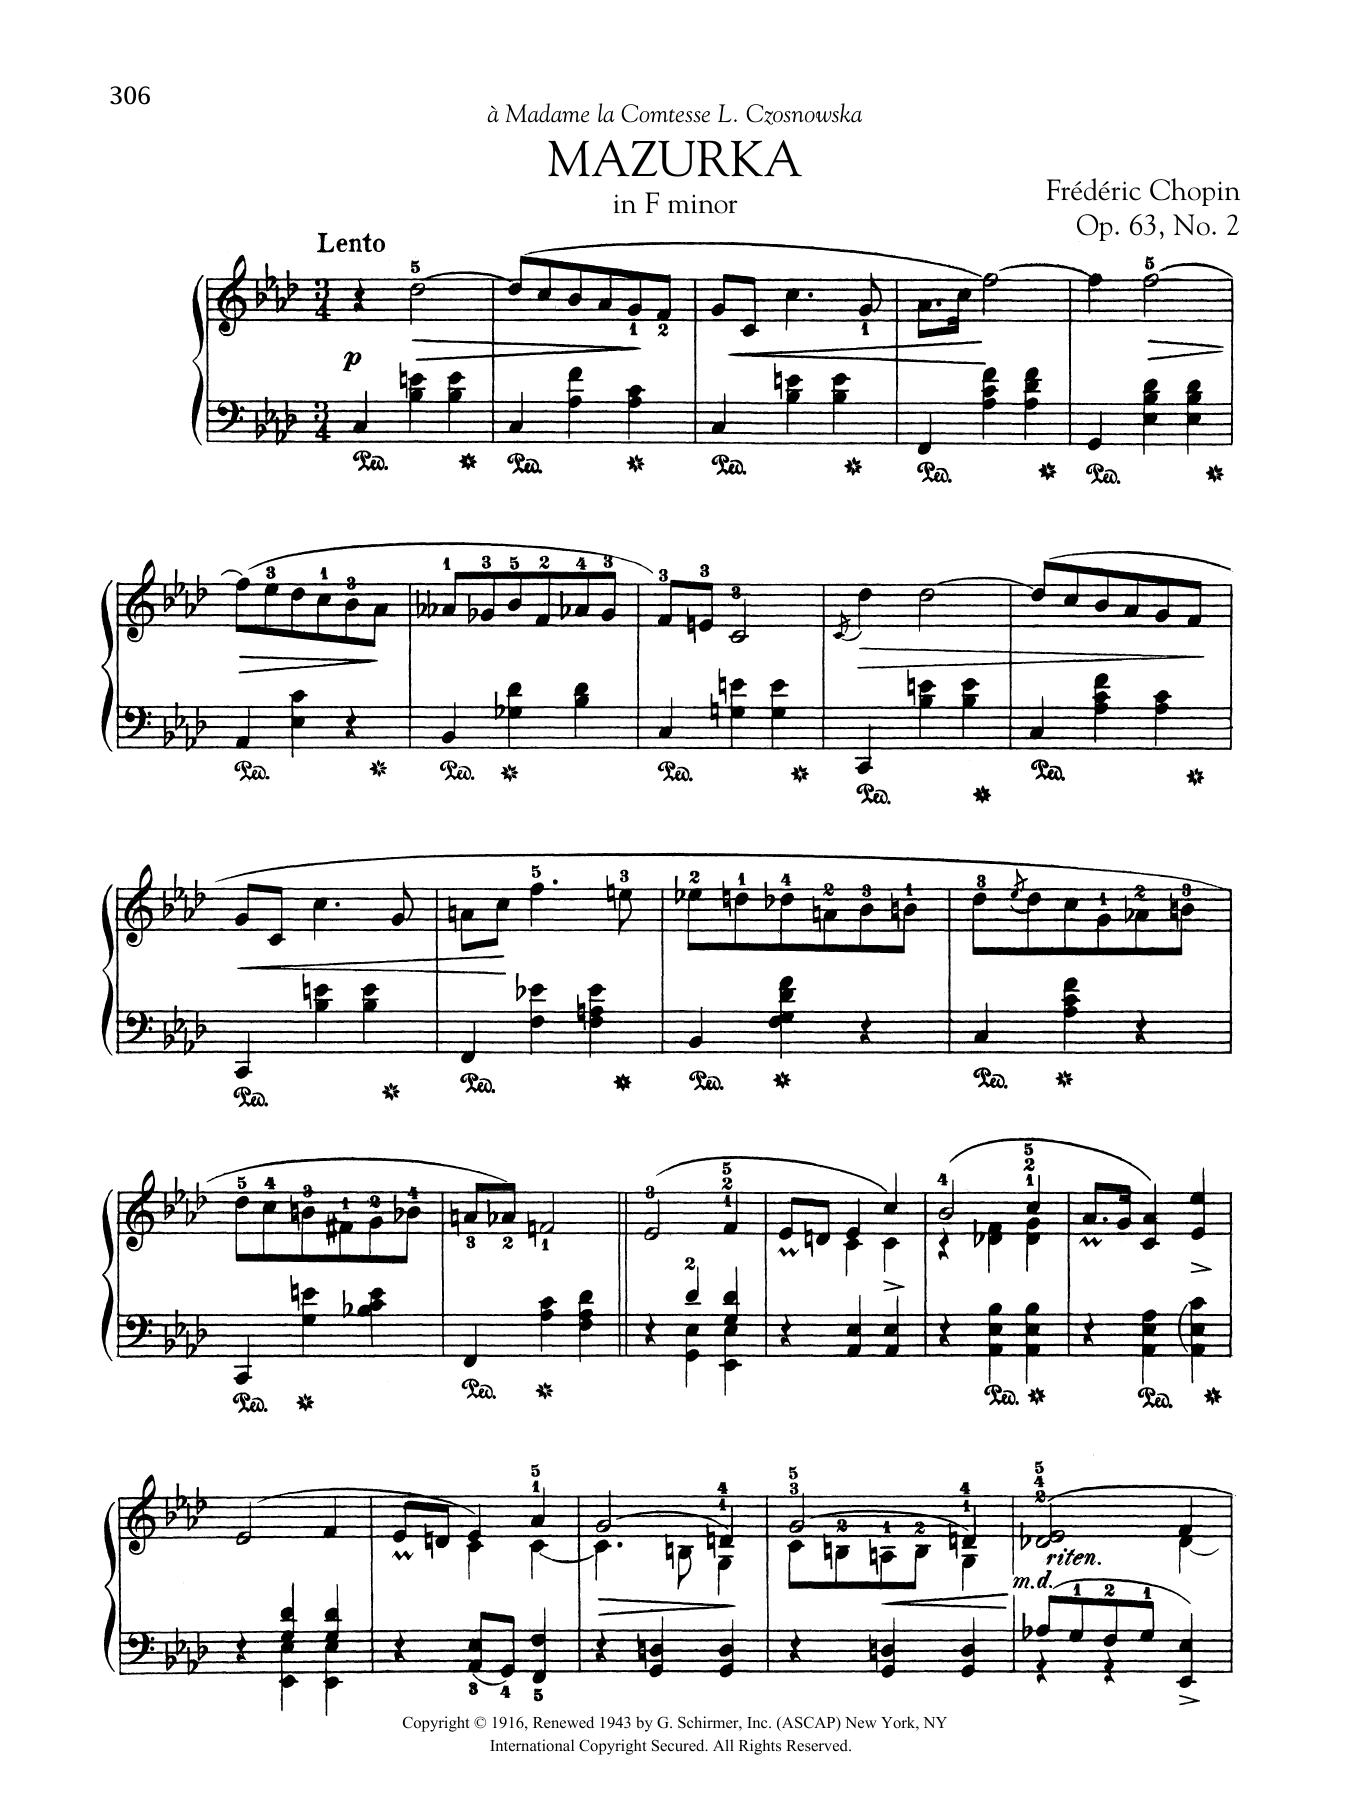 Mazurka in F minor, Op. 63, No. 2 Sheet Music